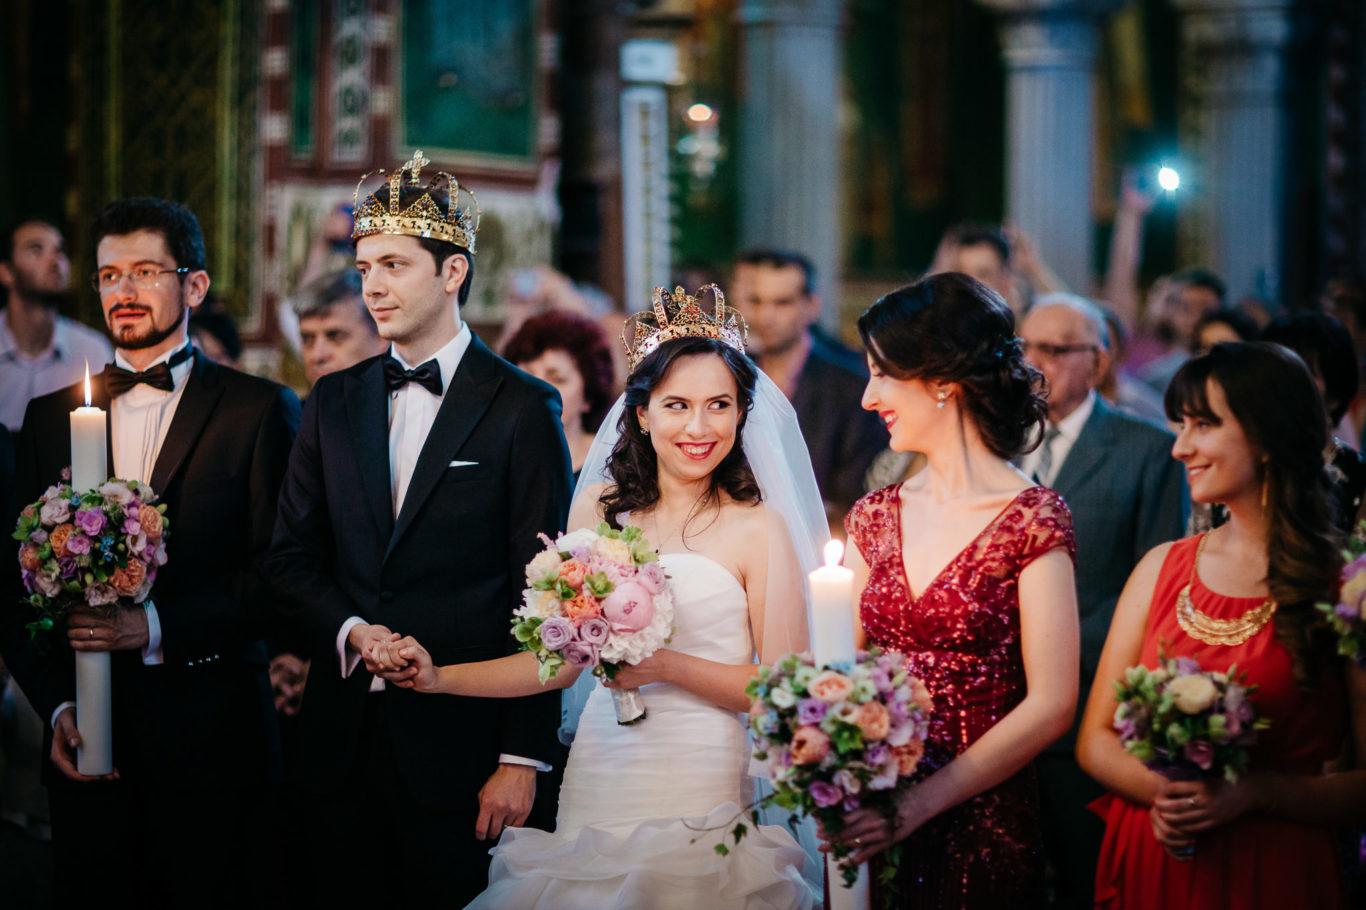 0462-Fotografie-nunta-Simona-Valentin-fotograf-Ciprian-Dumitrescu-CDF_9358